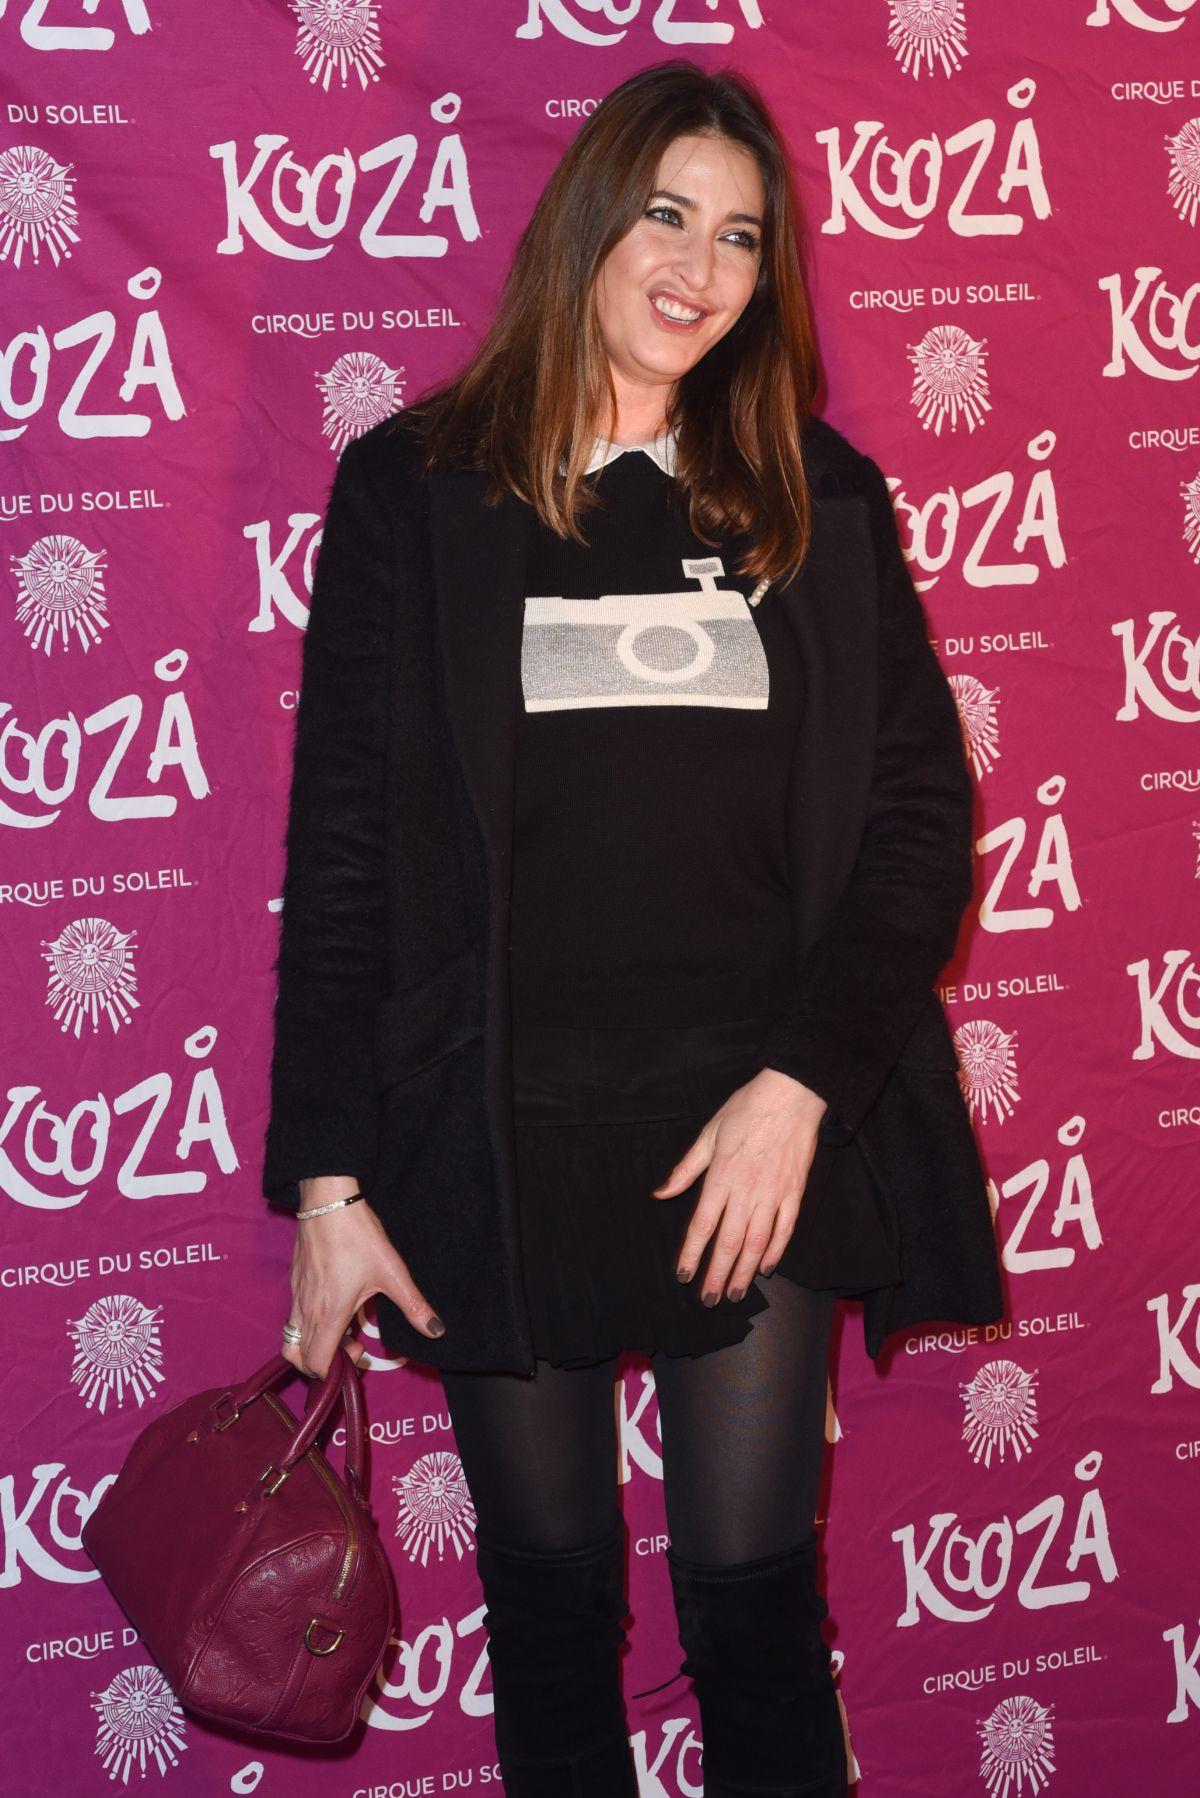 LISA SNOWDON at Kooza by Cirque du Soleil VIP Performance in London